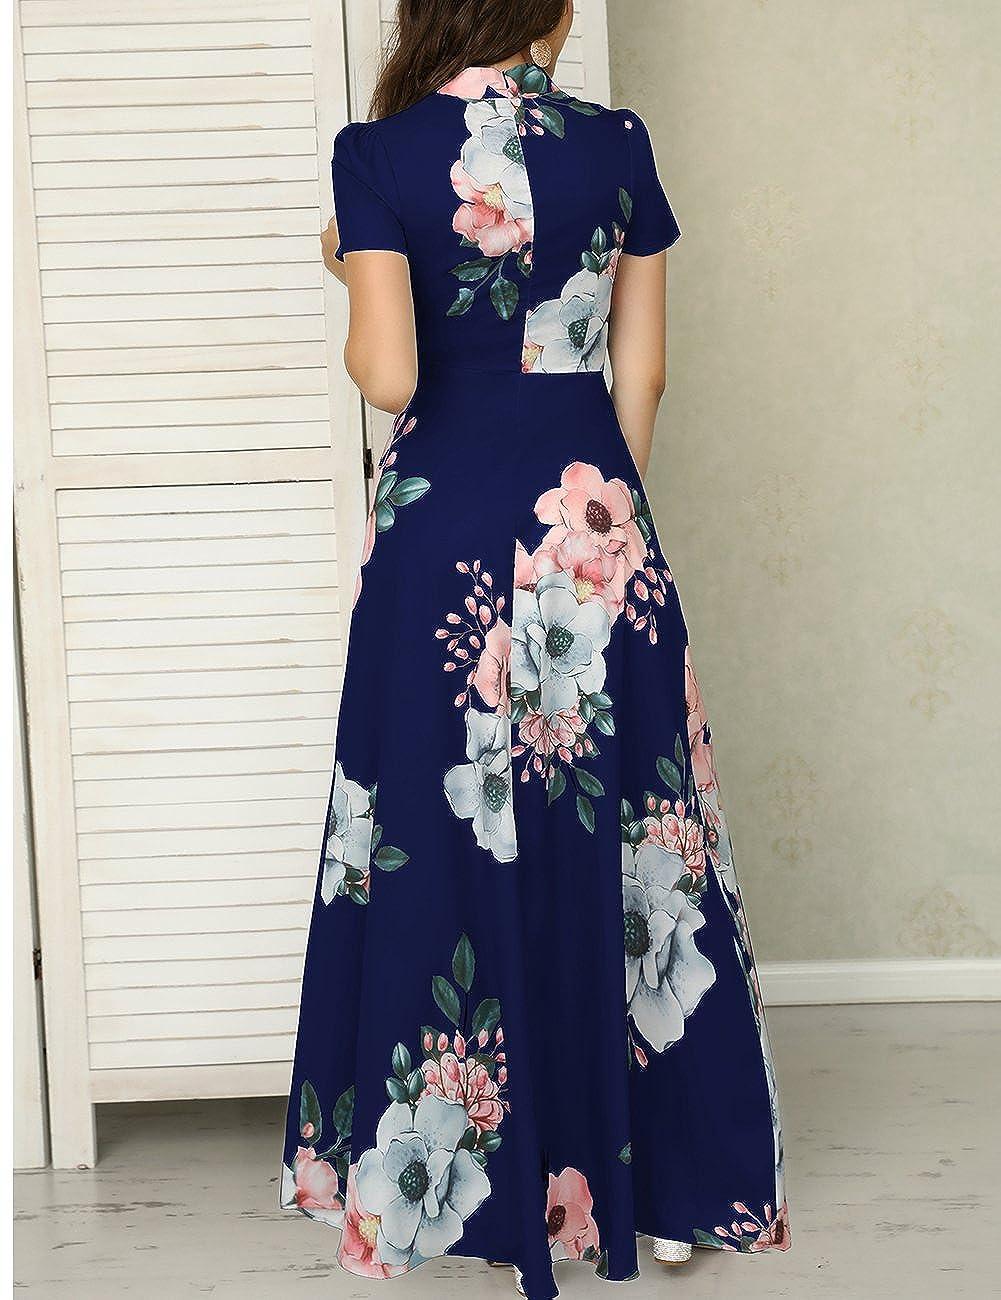 de816eaa95a Ivrose Womens Short Sleeves Floral Maxi Dress Blue L at Amazon Women s  Clothing store